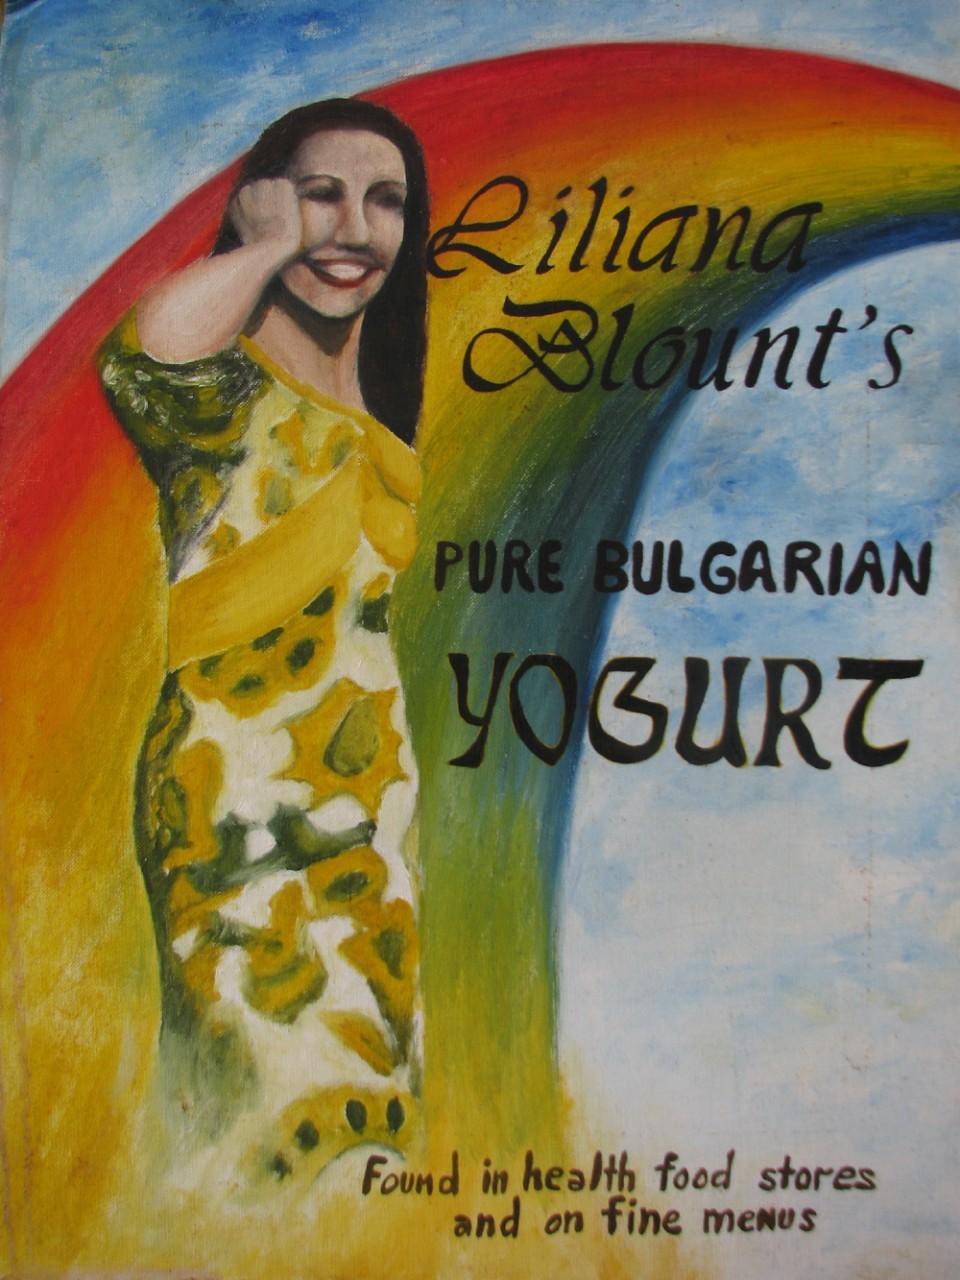 The Art of Making Bulgarian Yogurt by Liliana Blount